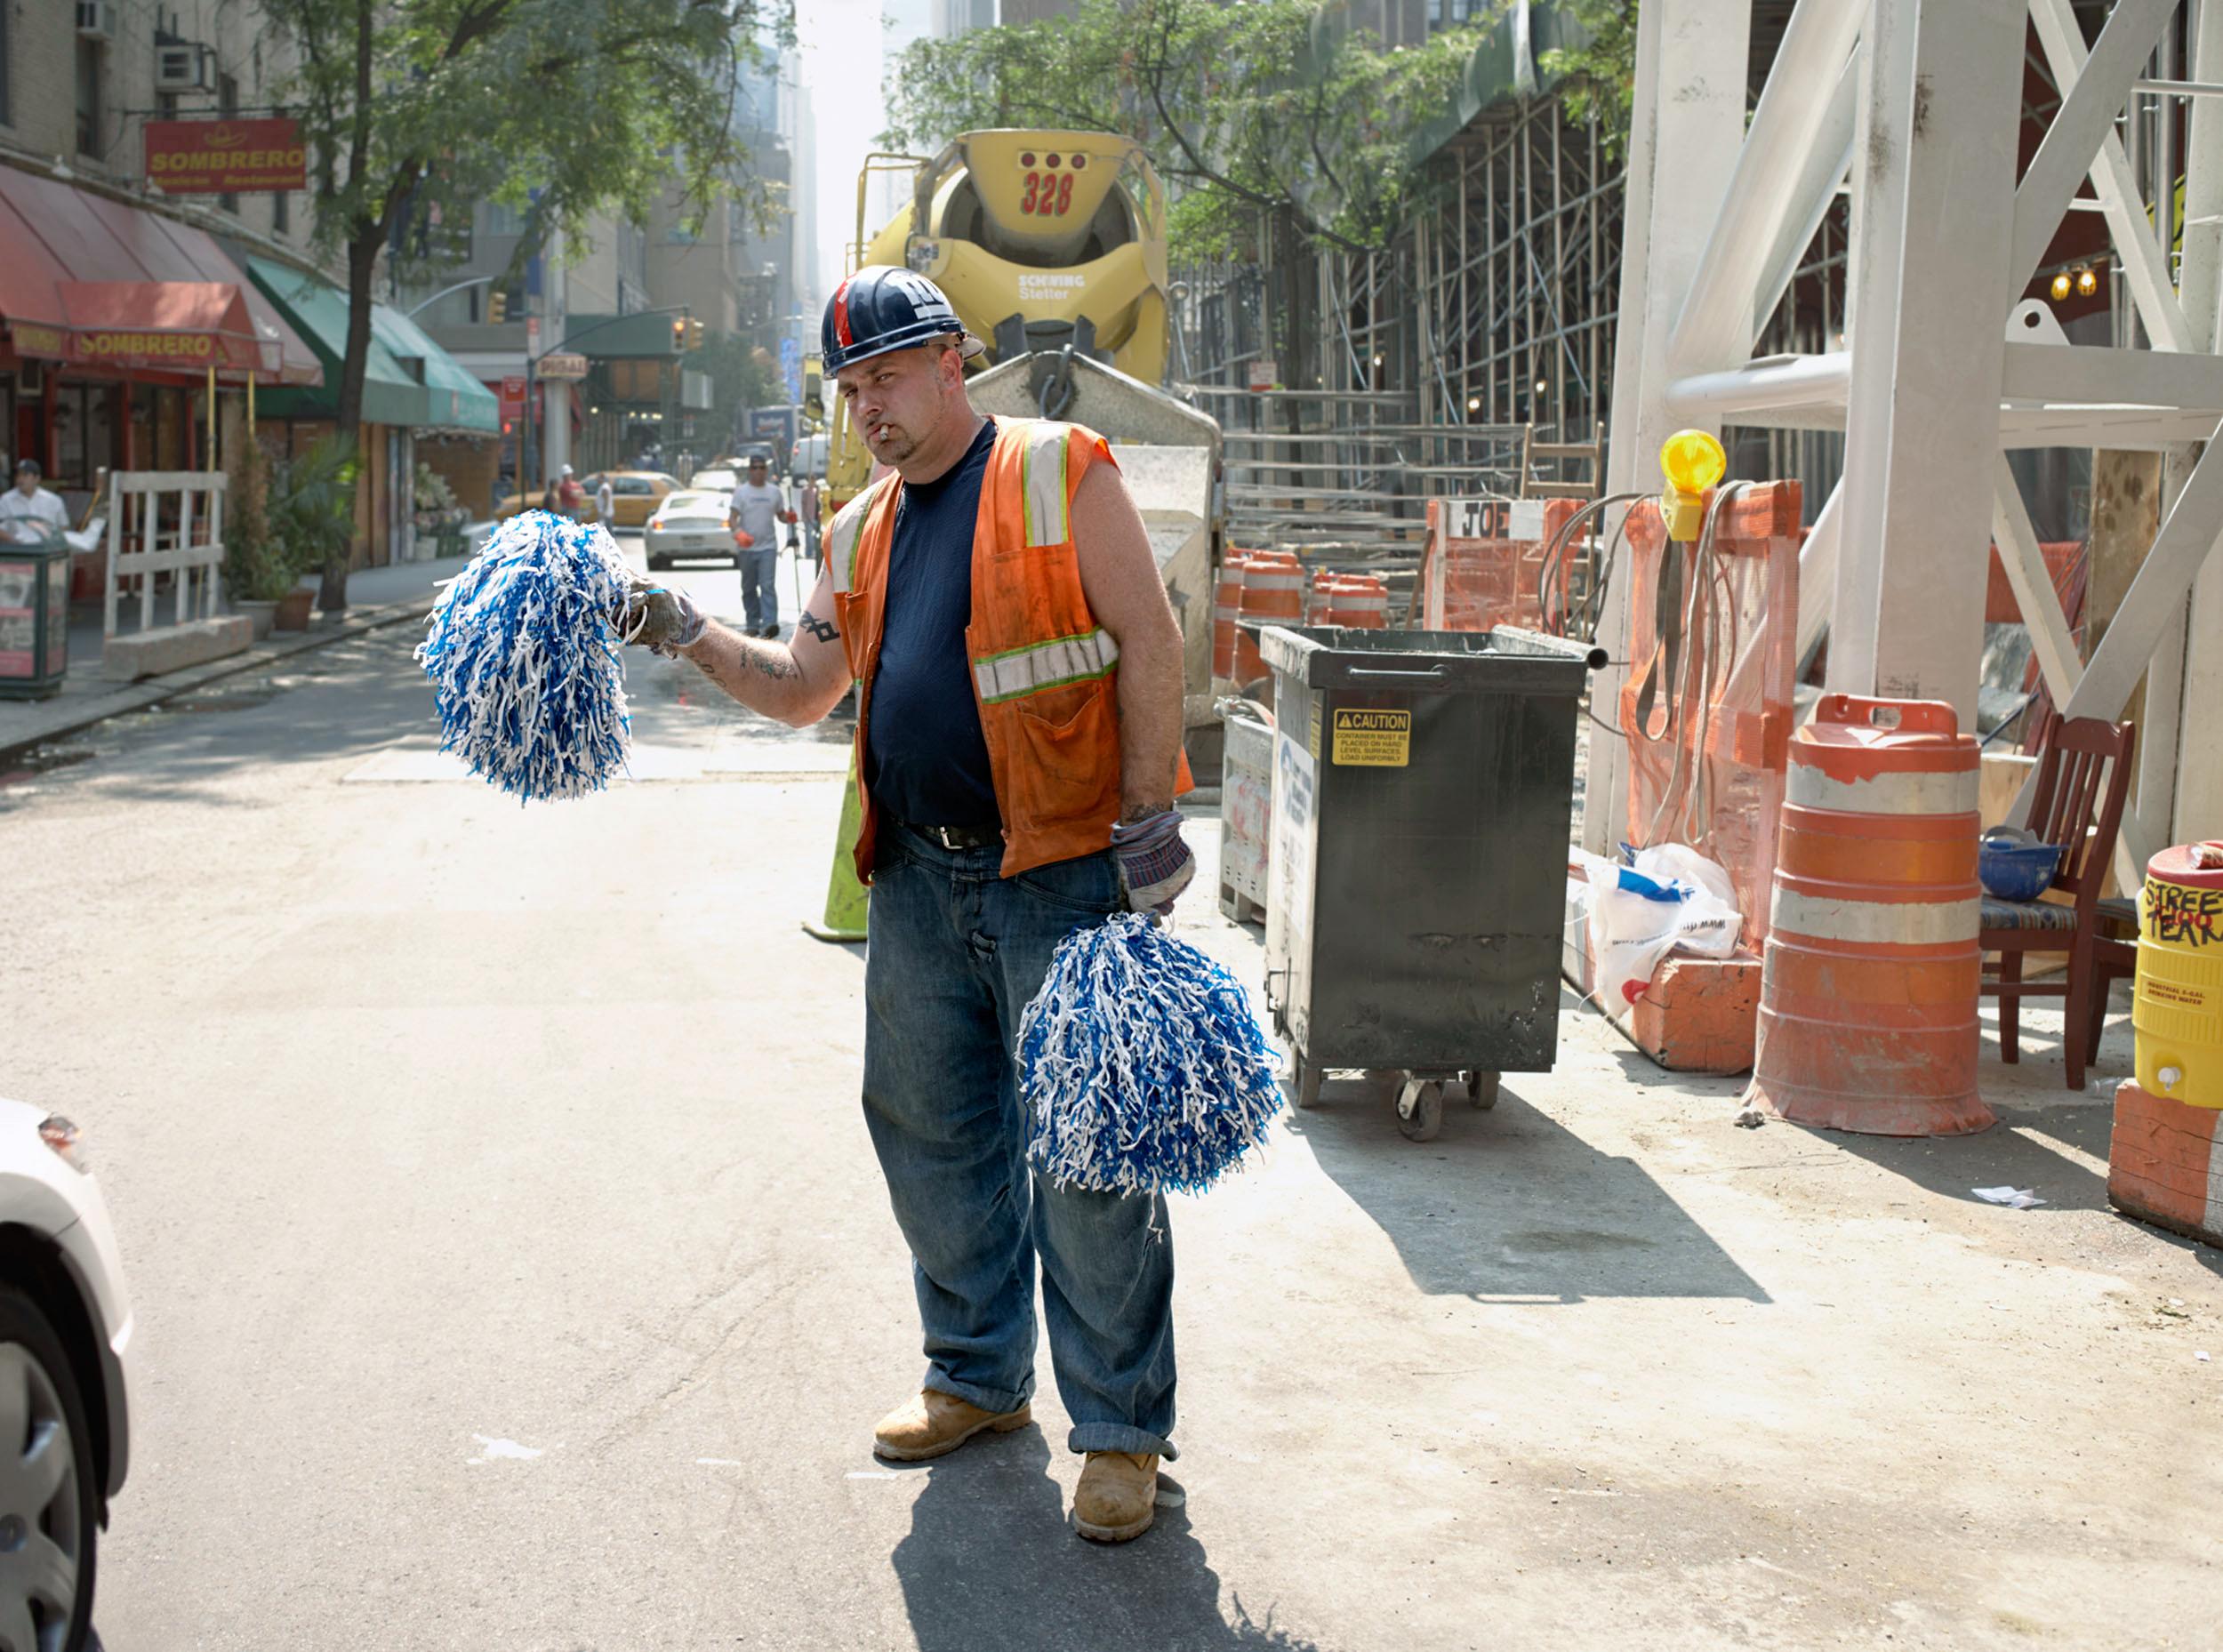 Construction Site Cheerleader